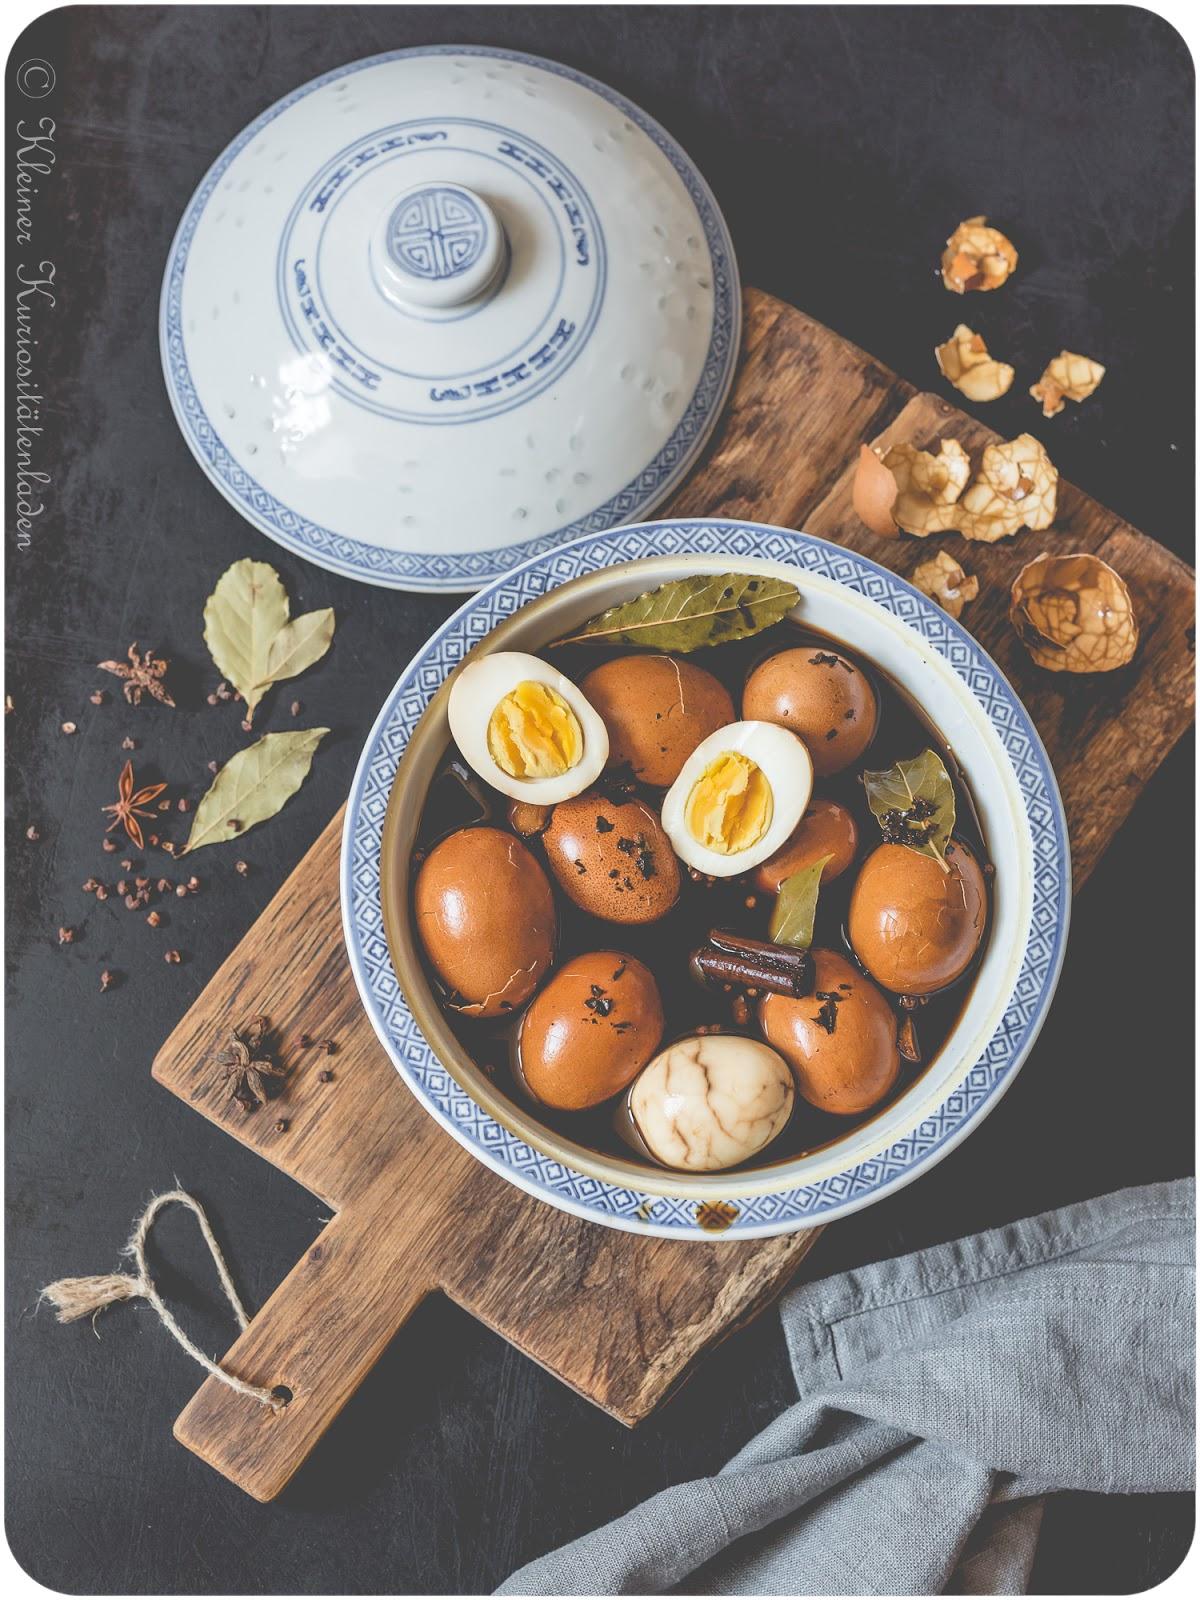 Chinesische Tee-Eier | 茶叶蛋